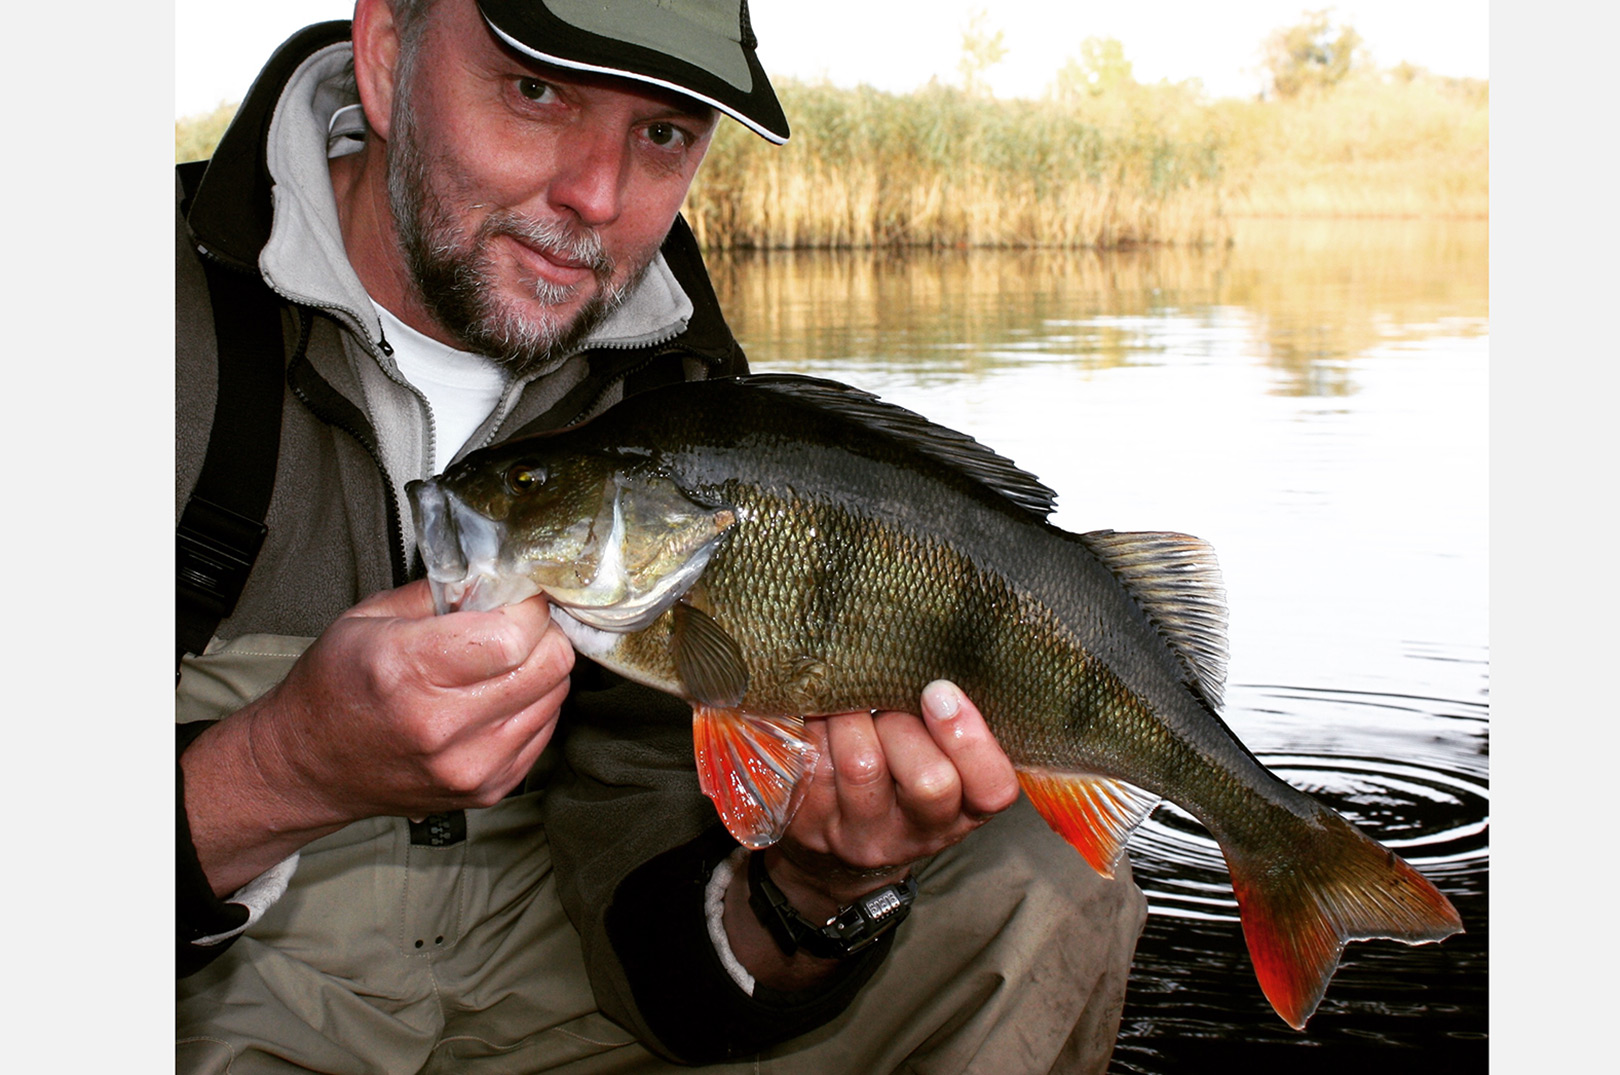 Fiskeribiolog Steen Ulnits